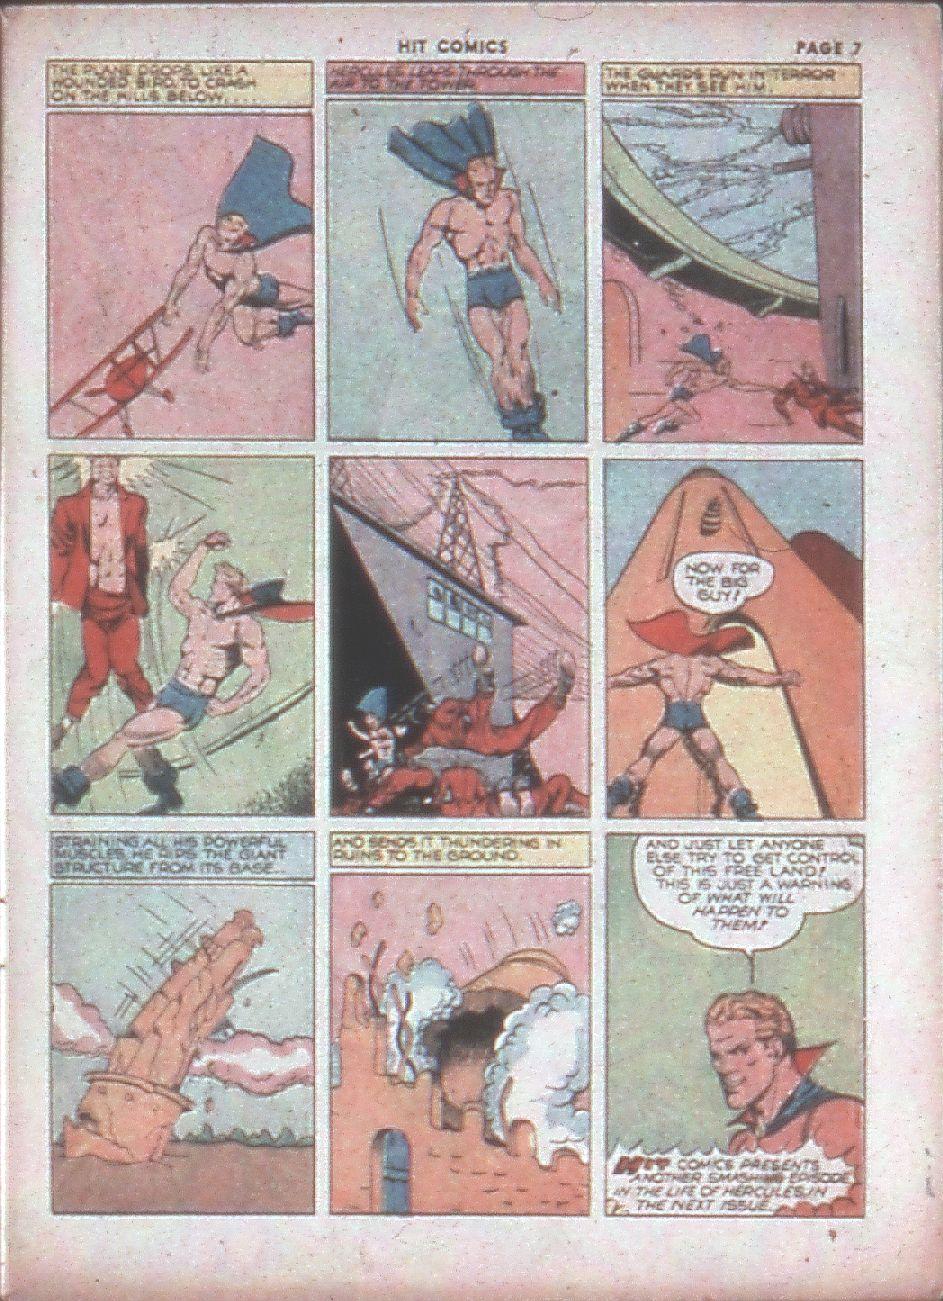 Read online Hit Comics comic -  Issue #8 - 9